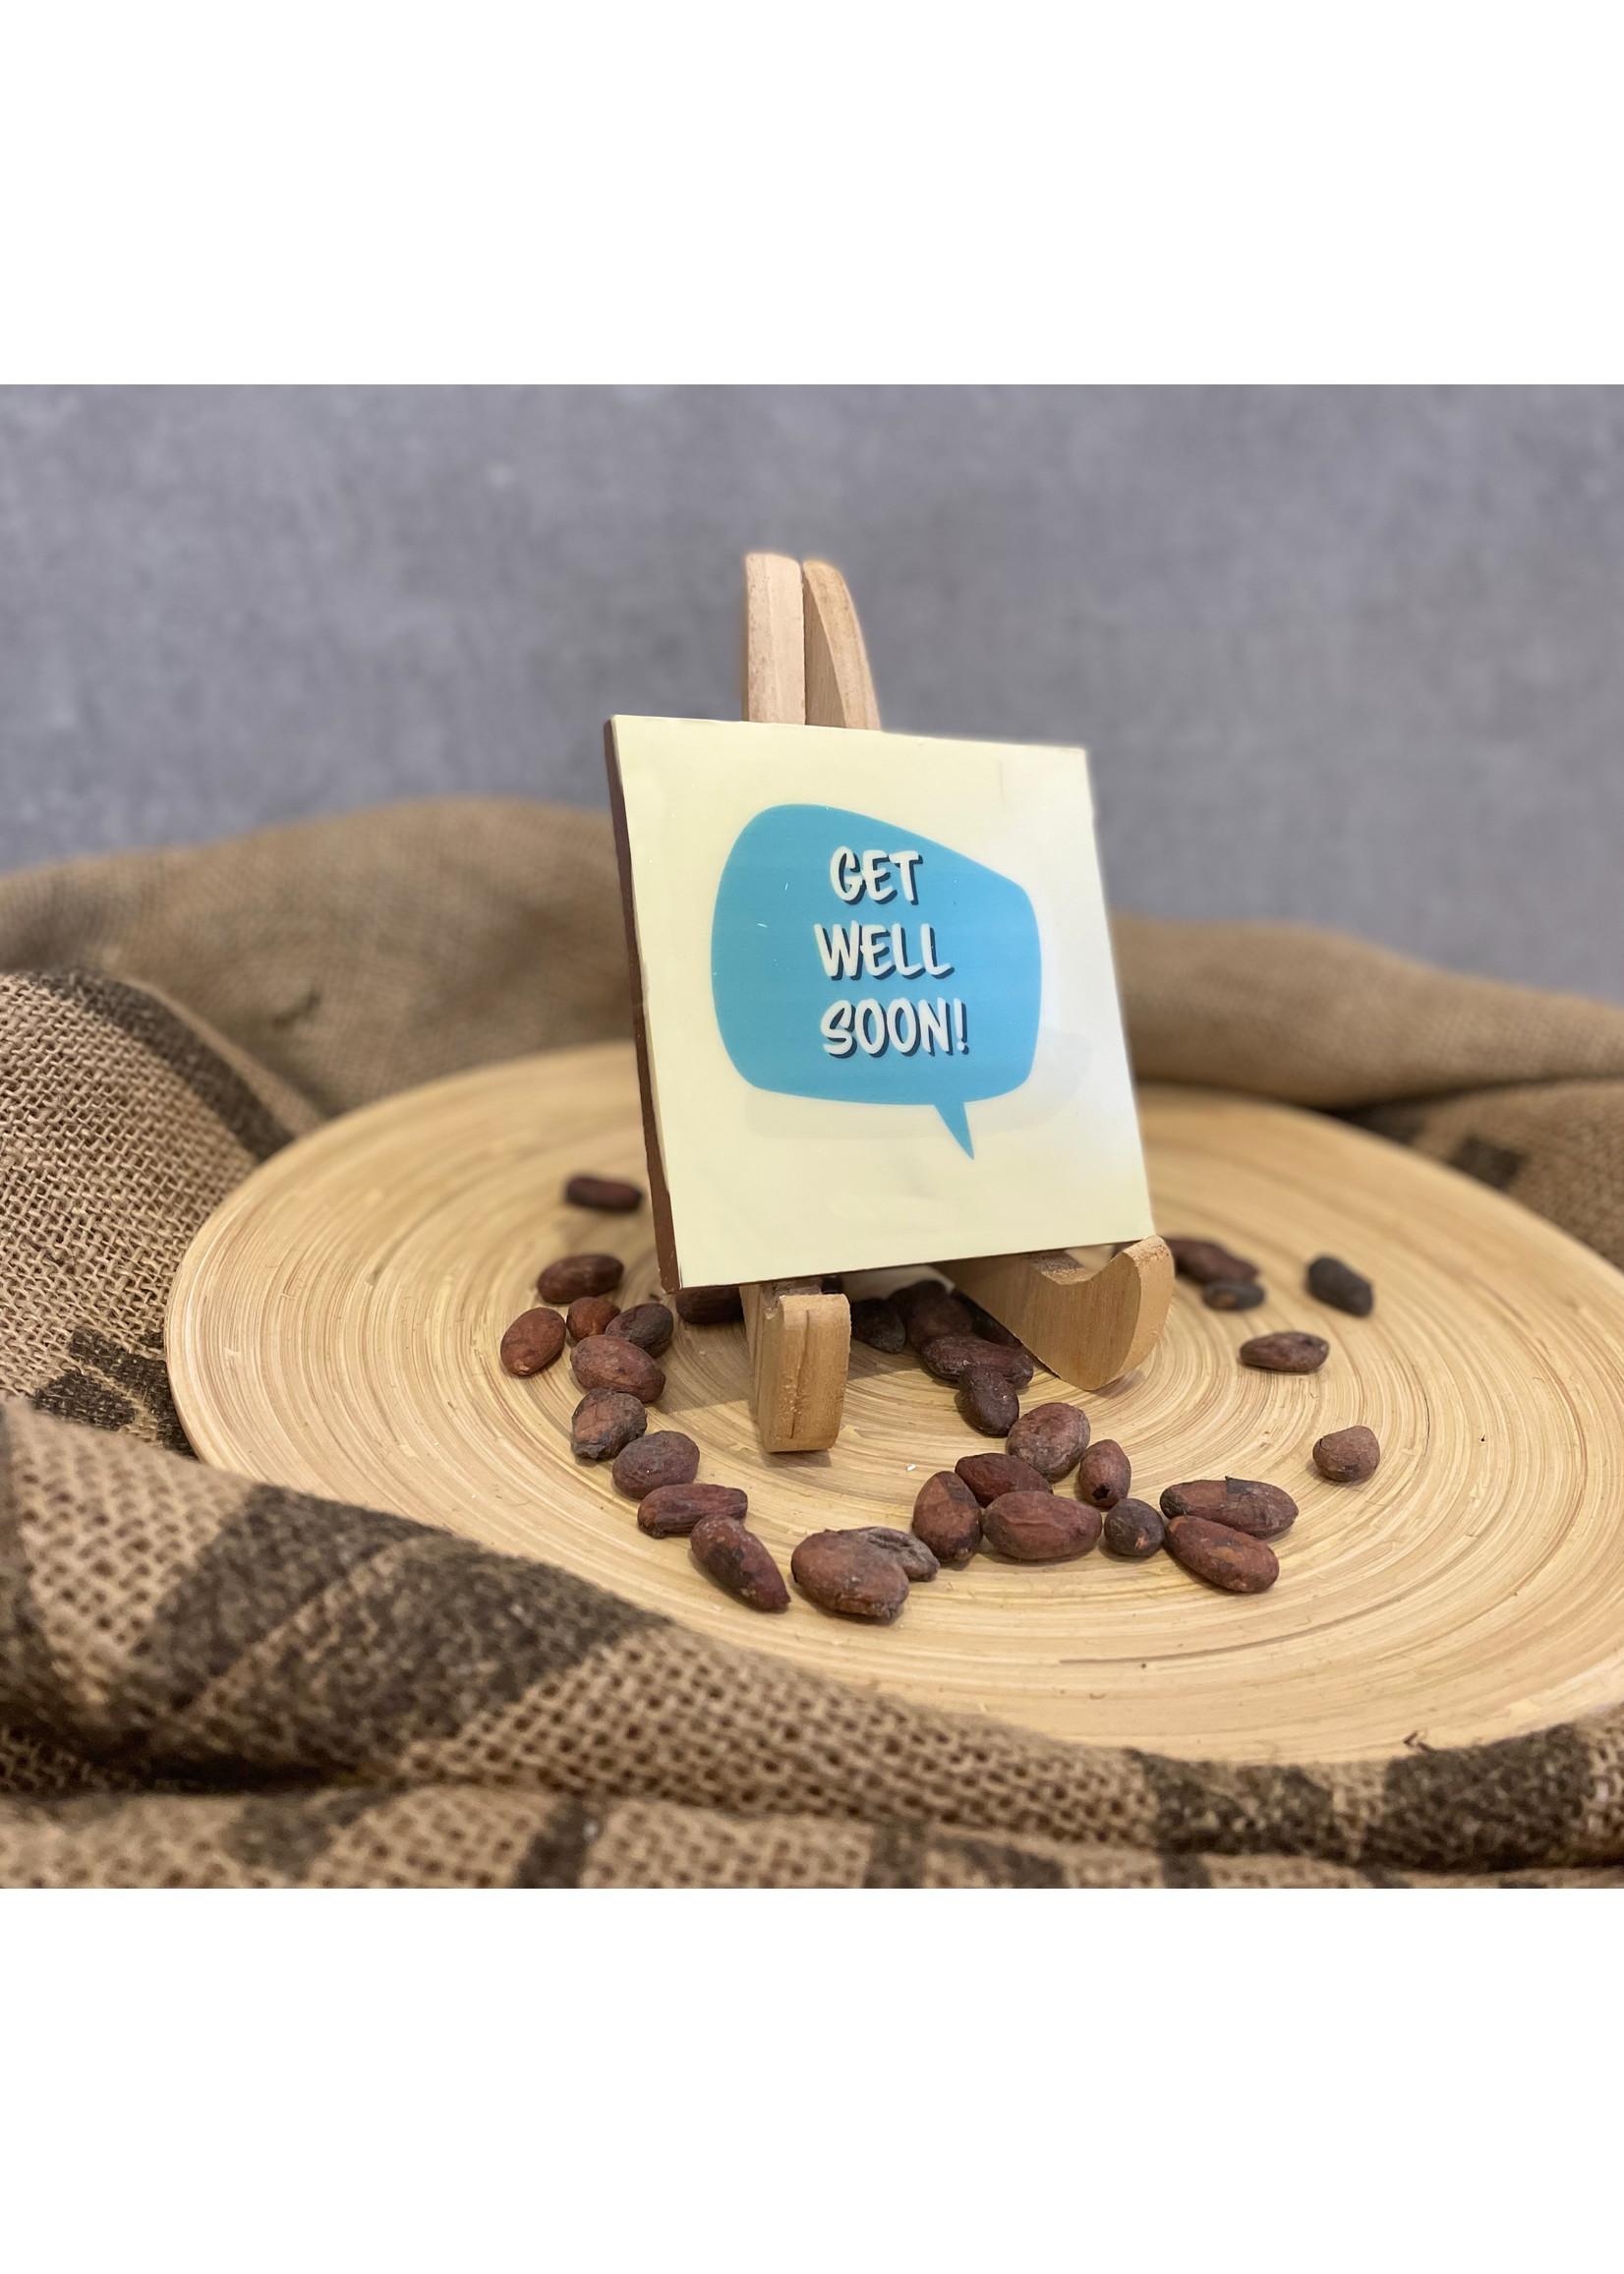 Get well soon chocolate!